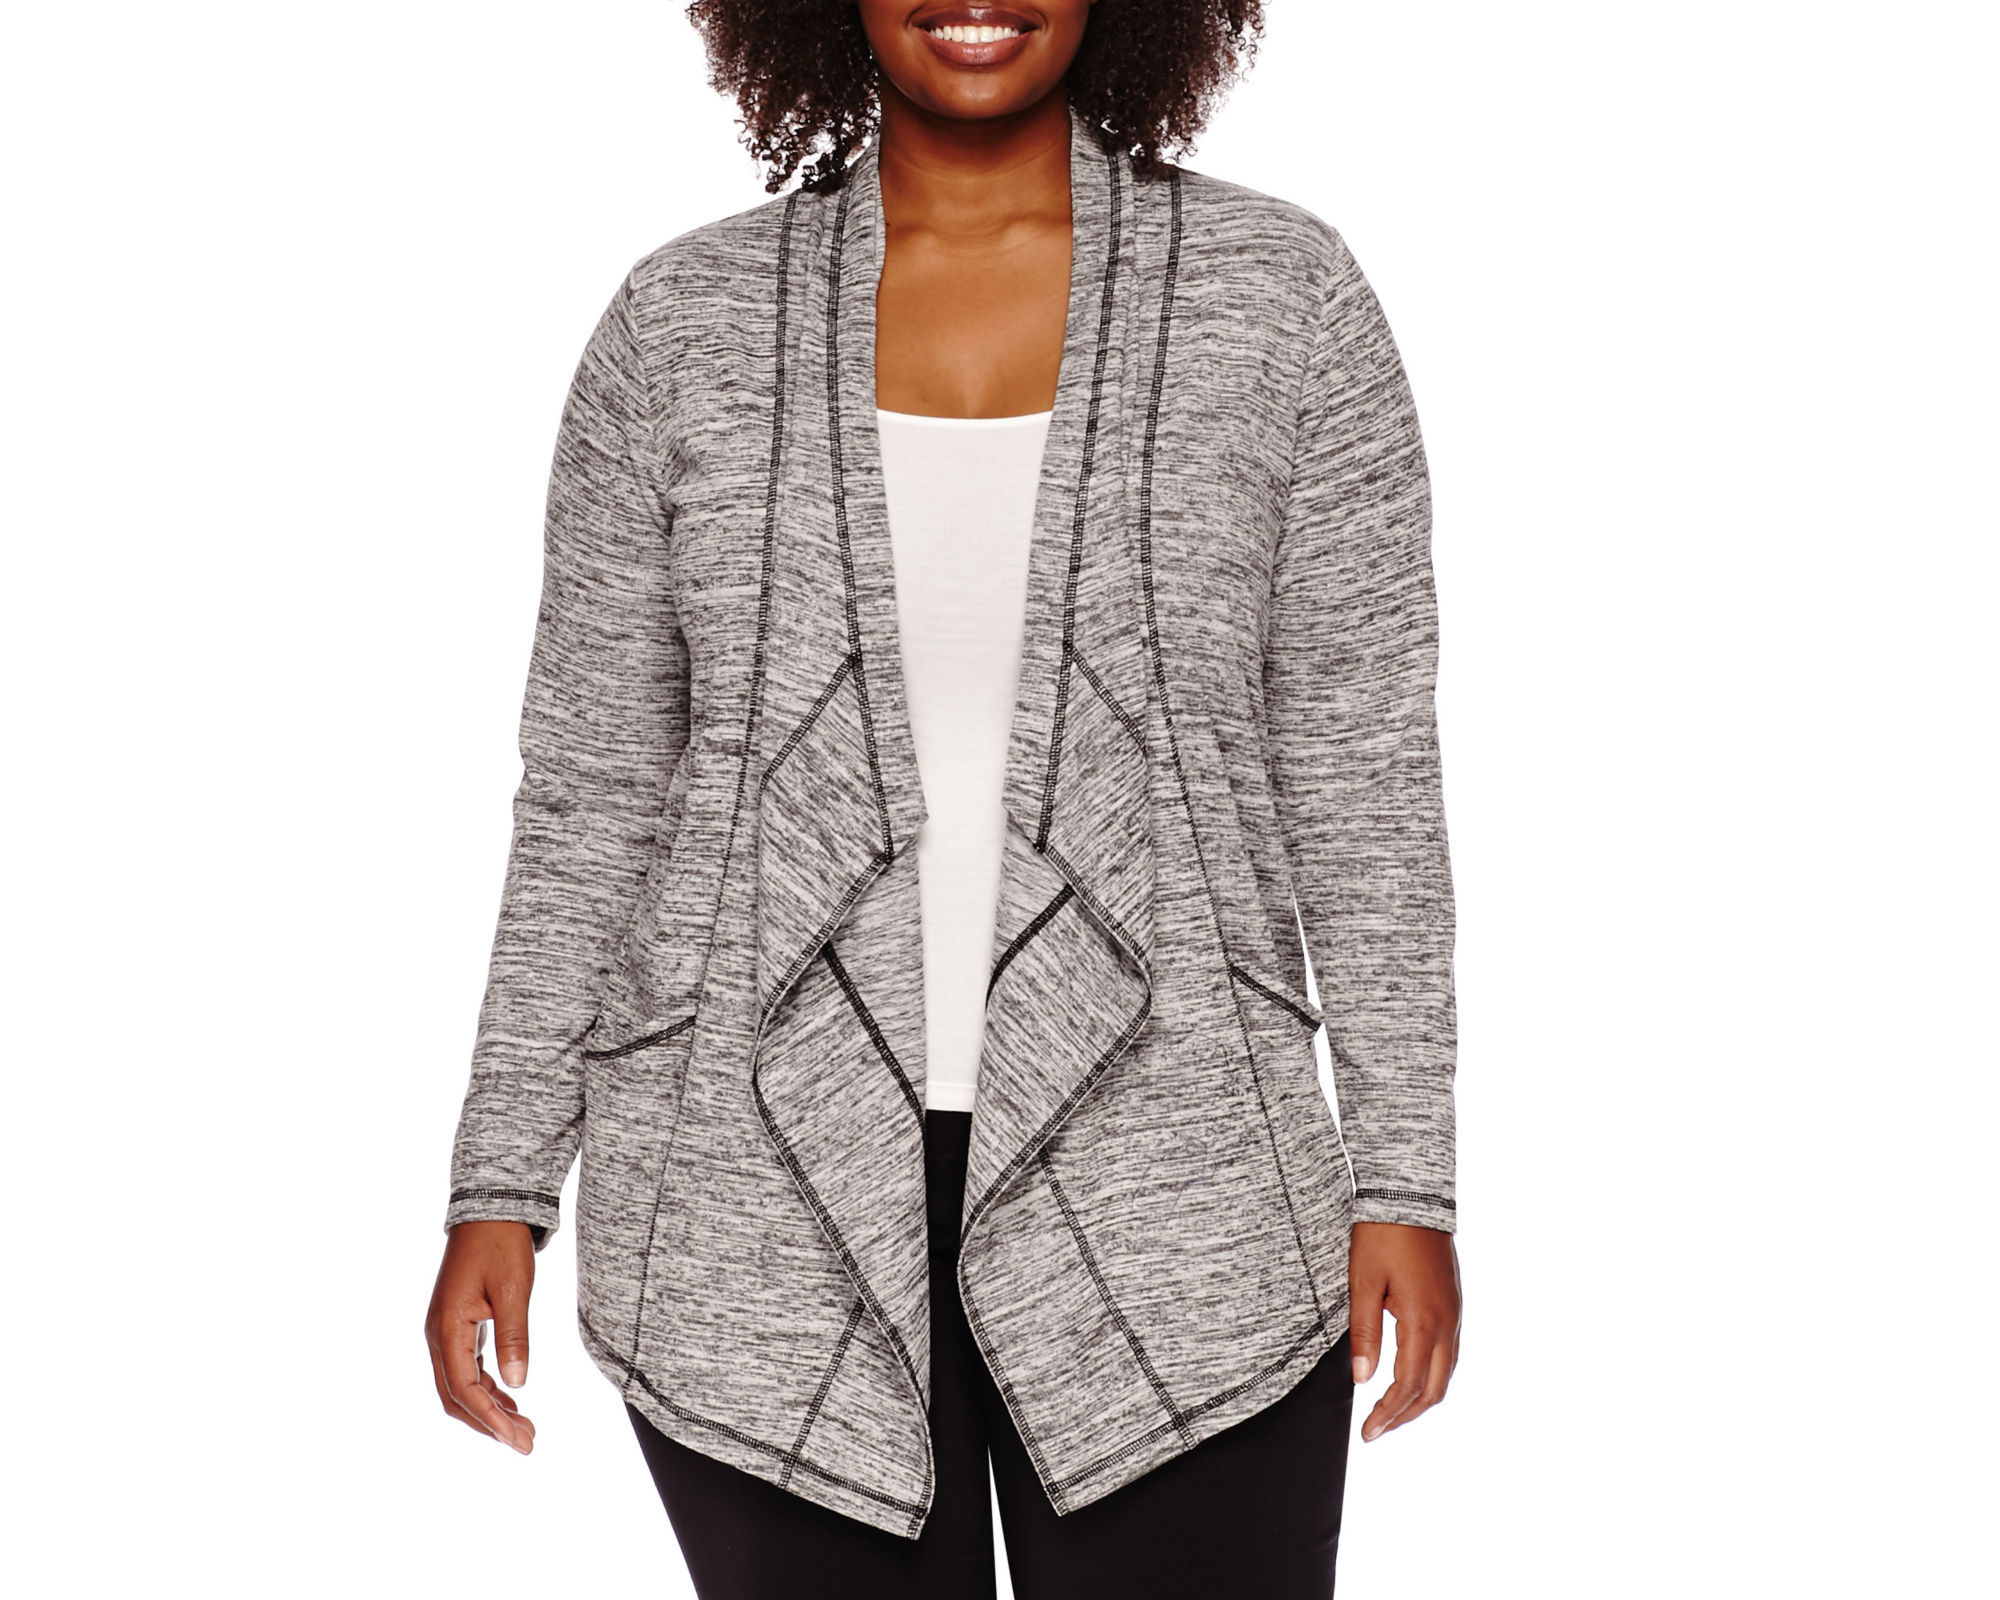 Liz Claiborne Long-Sleeve Drape Knit Cardigan - Plus